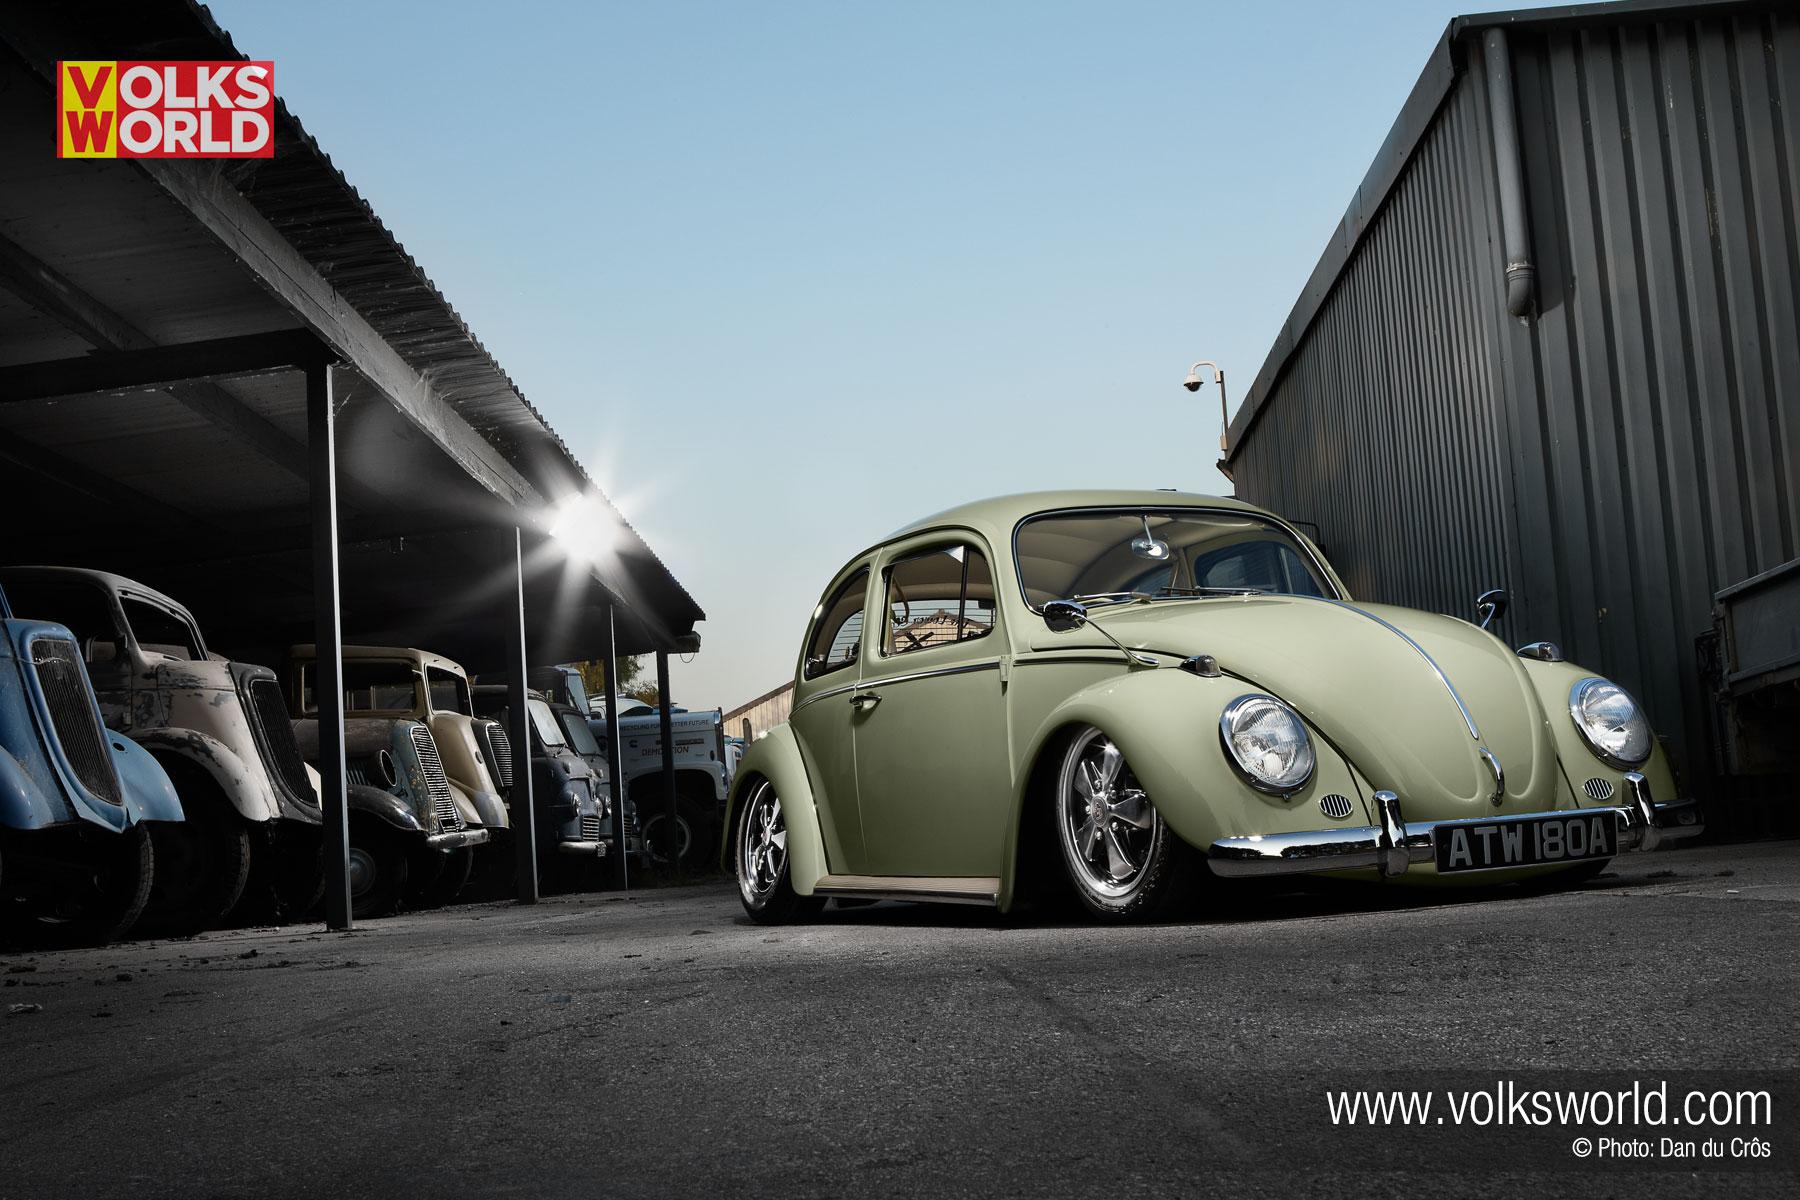 1963 VW Beetle Wallpaper 01jpg 1800x1200